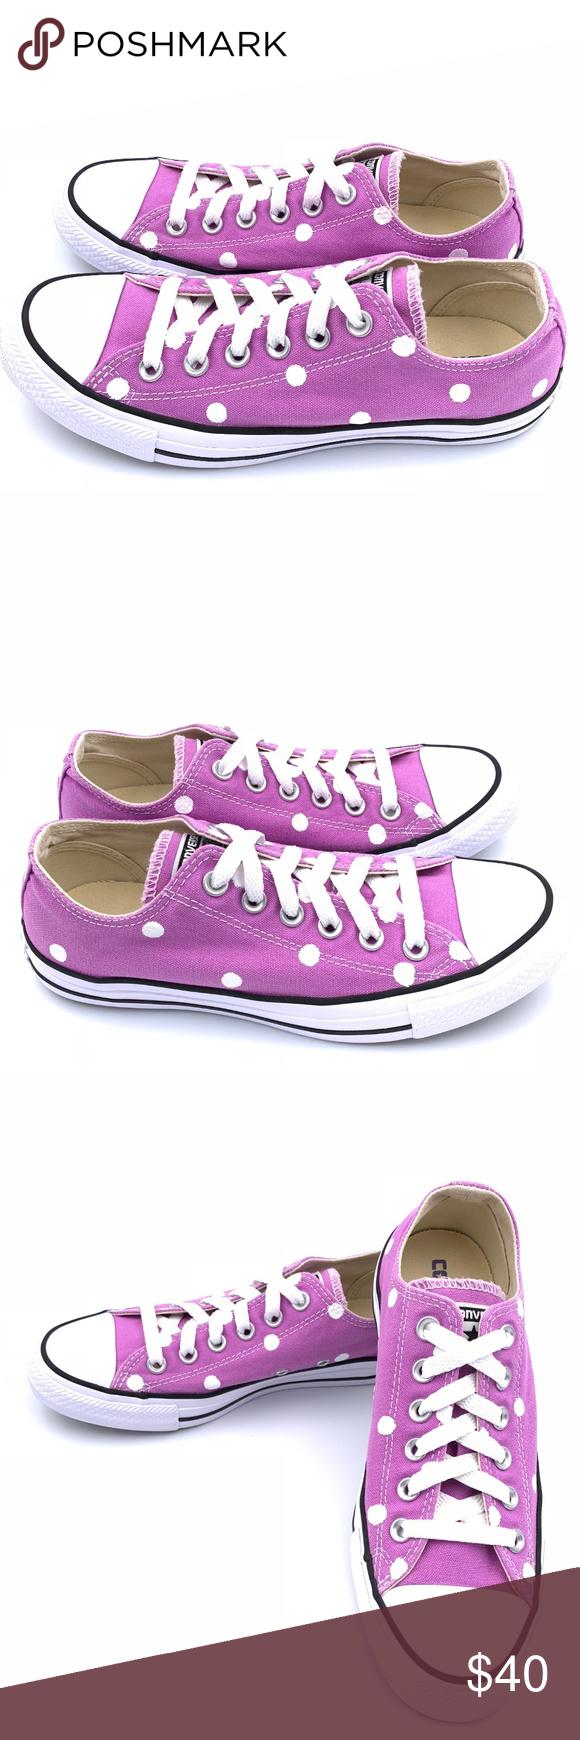 21daee48786 Converse 8 FUCHSIA GLOW Purple Polka Dot CTAS Hand painted unisex Converse  Chuck Taylor All-